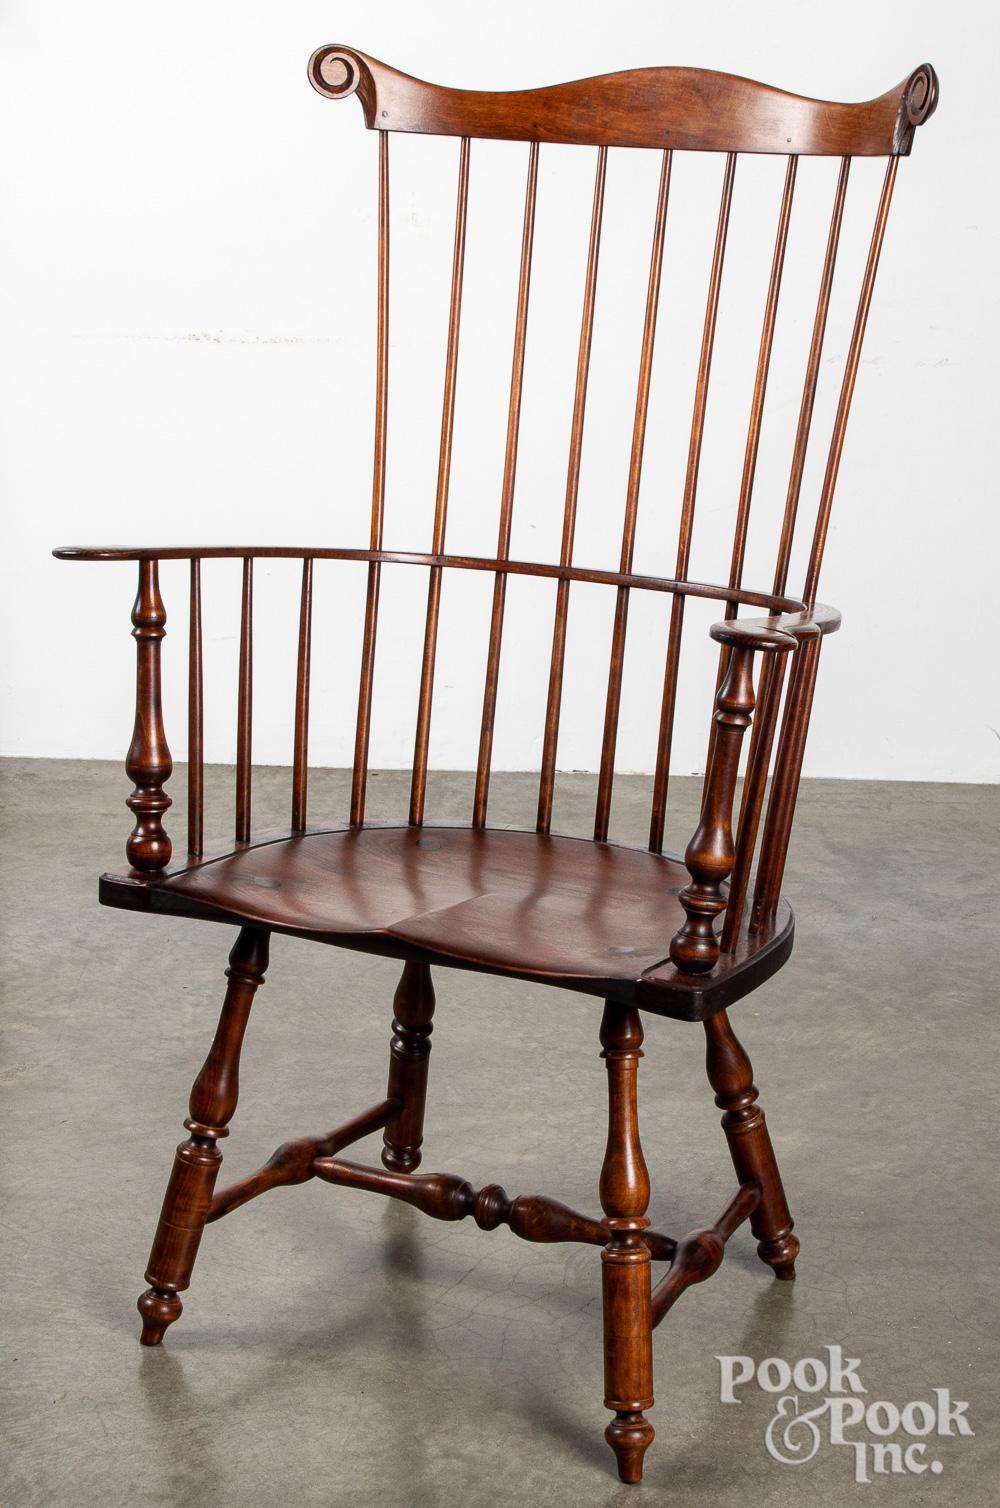 Drew Lausch contemporary Windsor armchair.